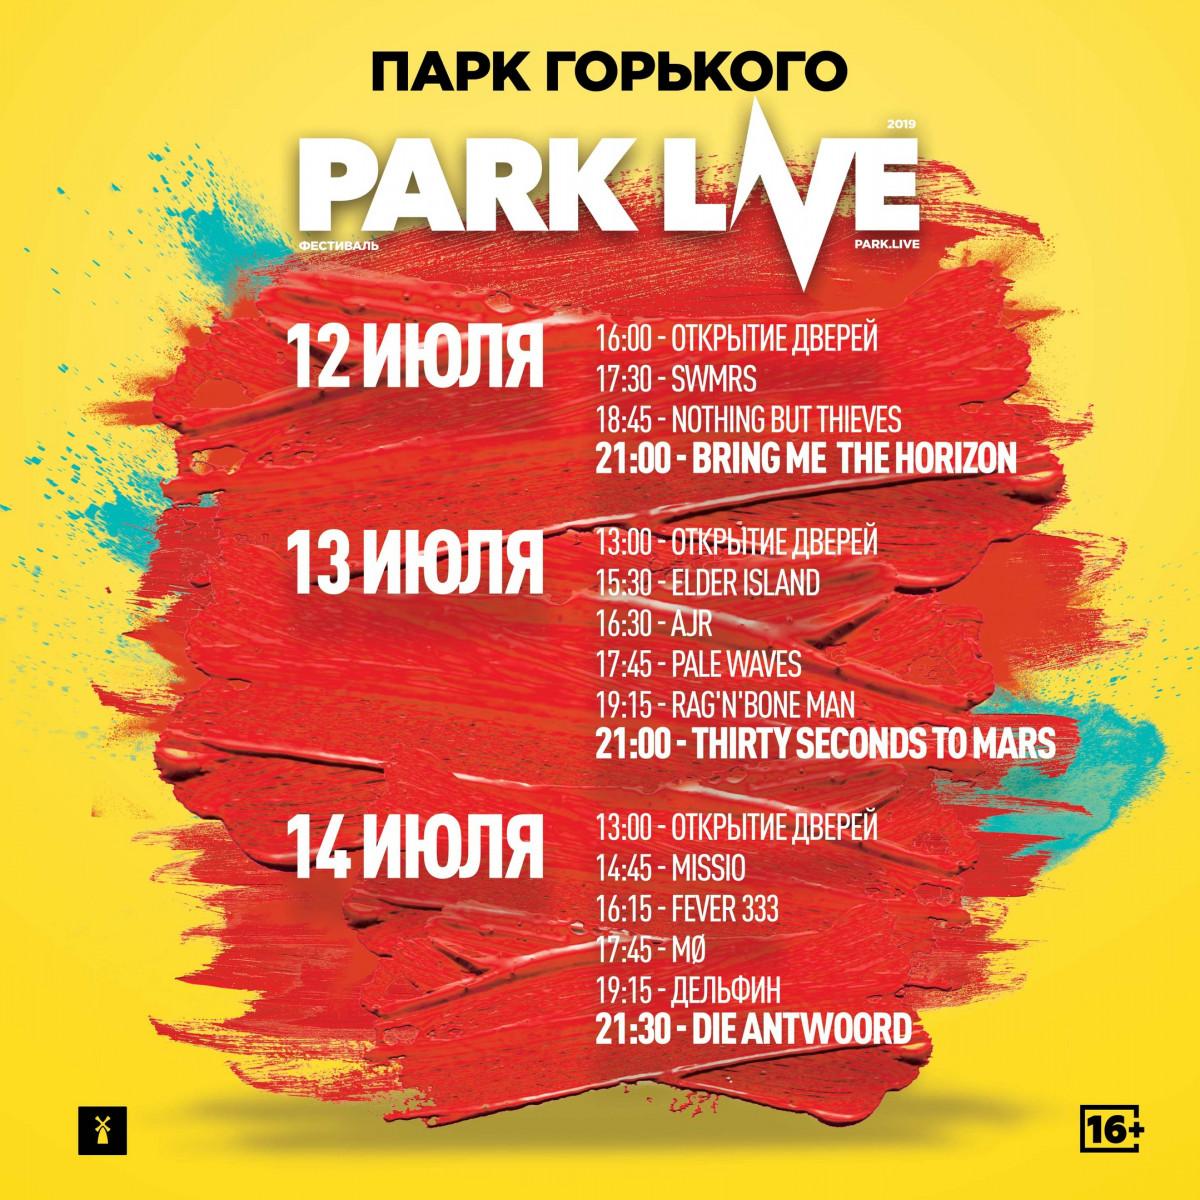 Фестиваль Park Live в Москве